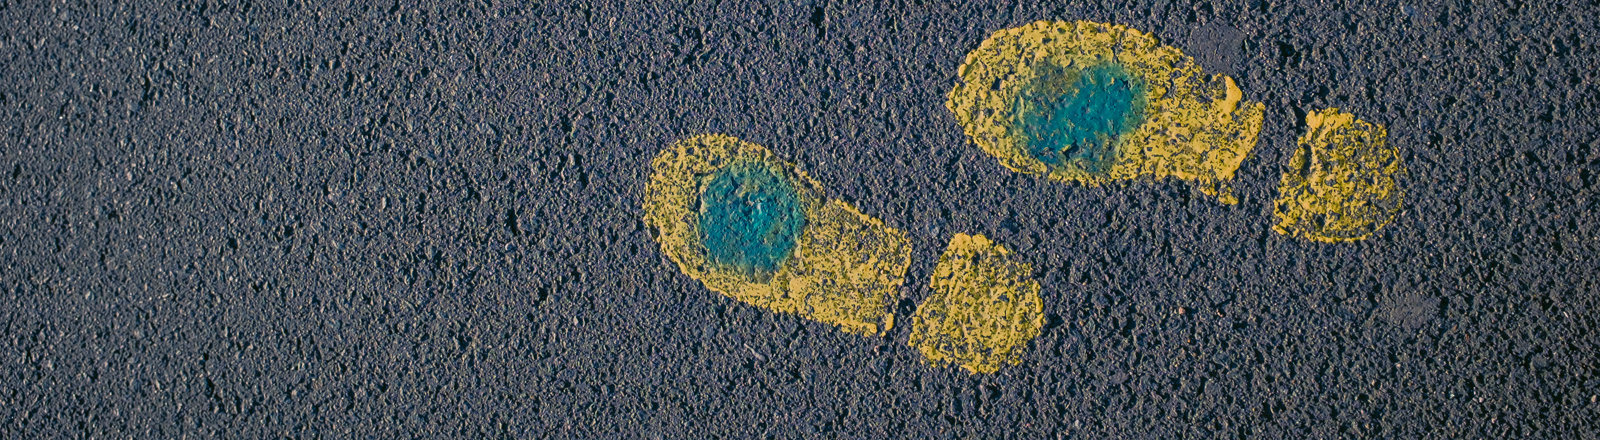 Gelbe Schuhabdrücke